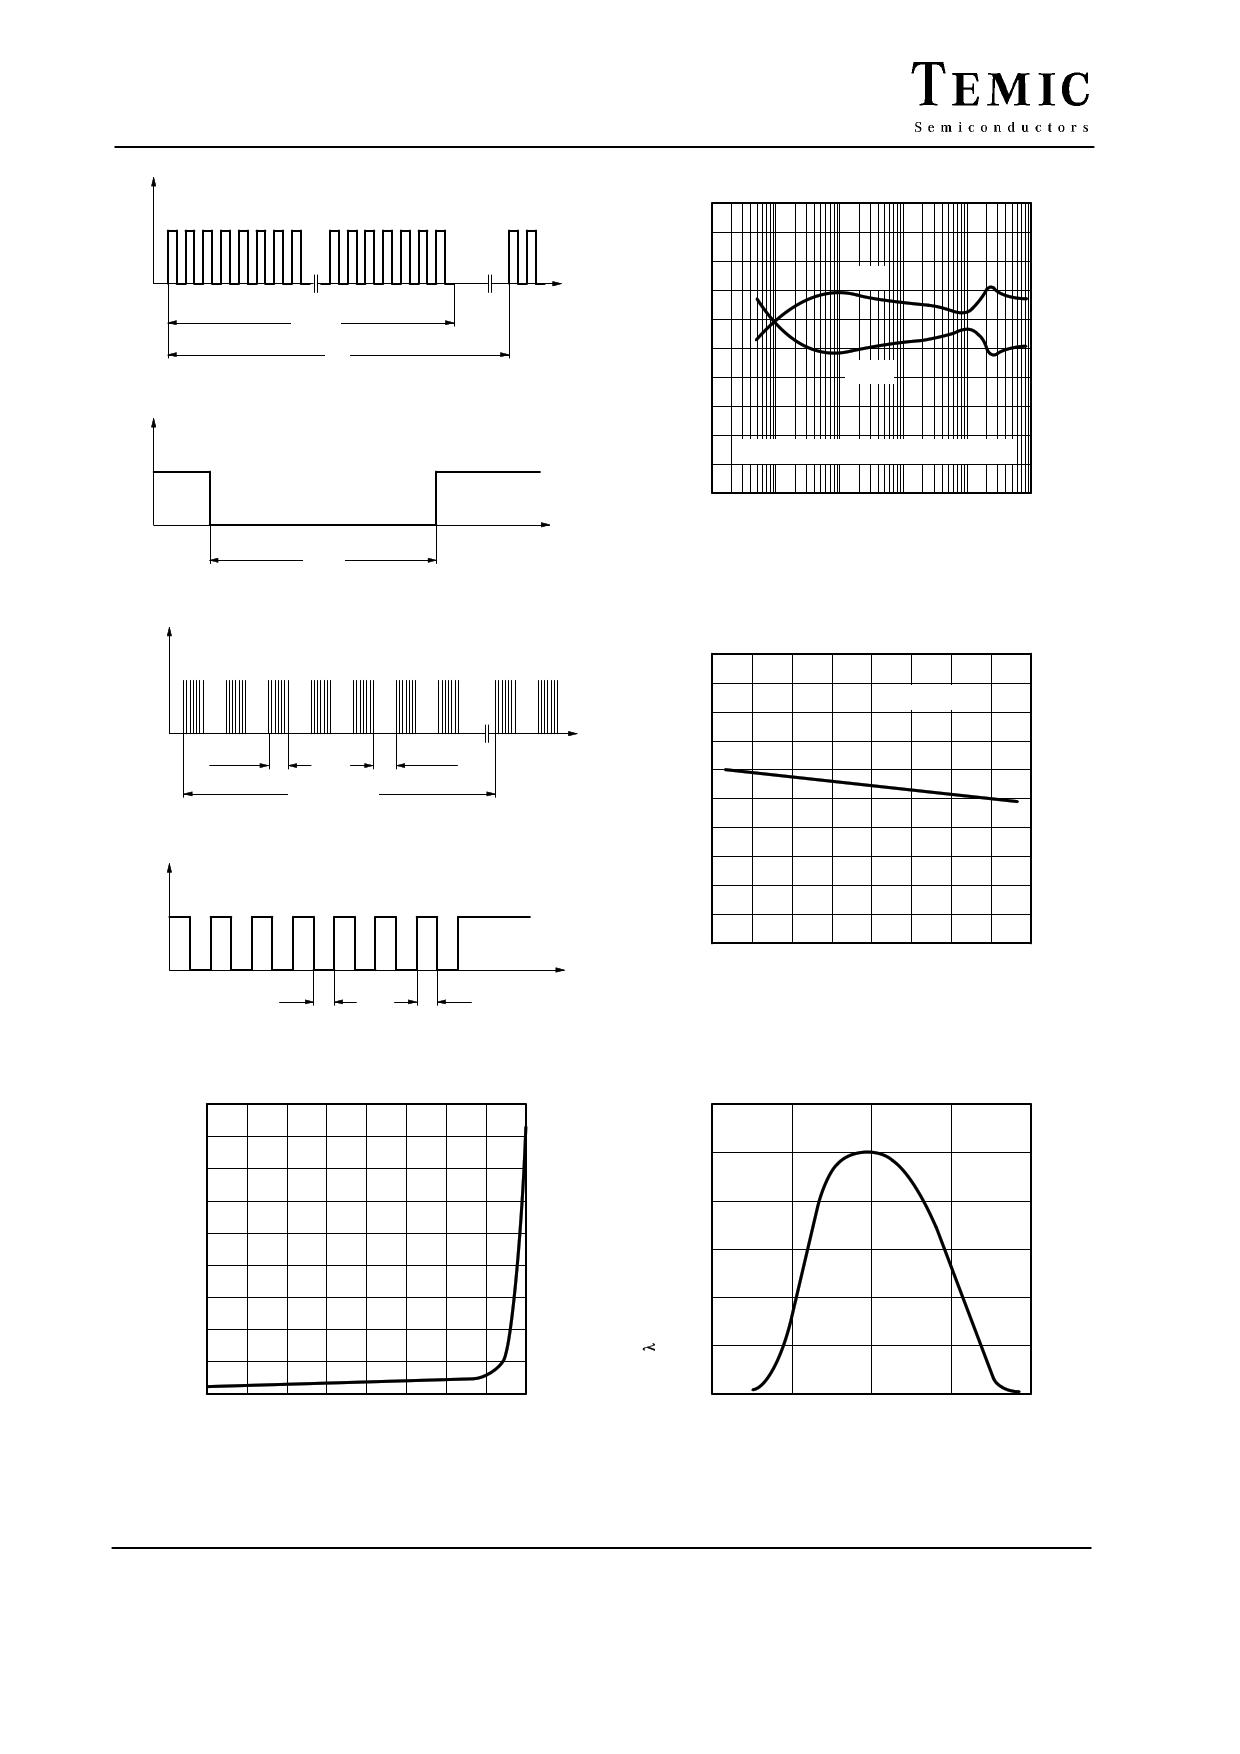 TFMT5400 pdf, 반도체, 판매, 대치품